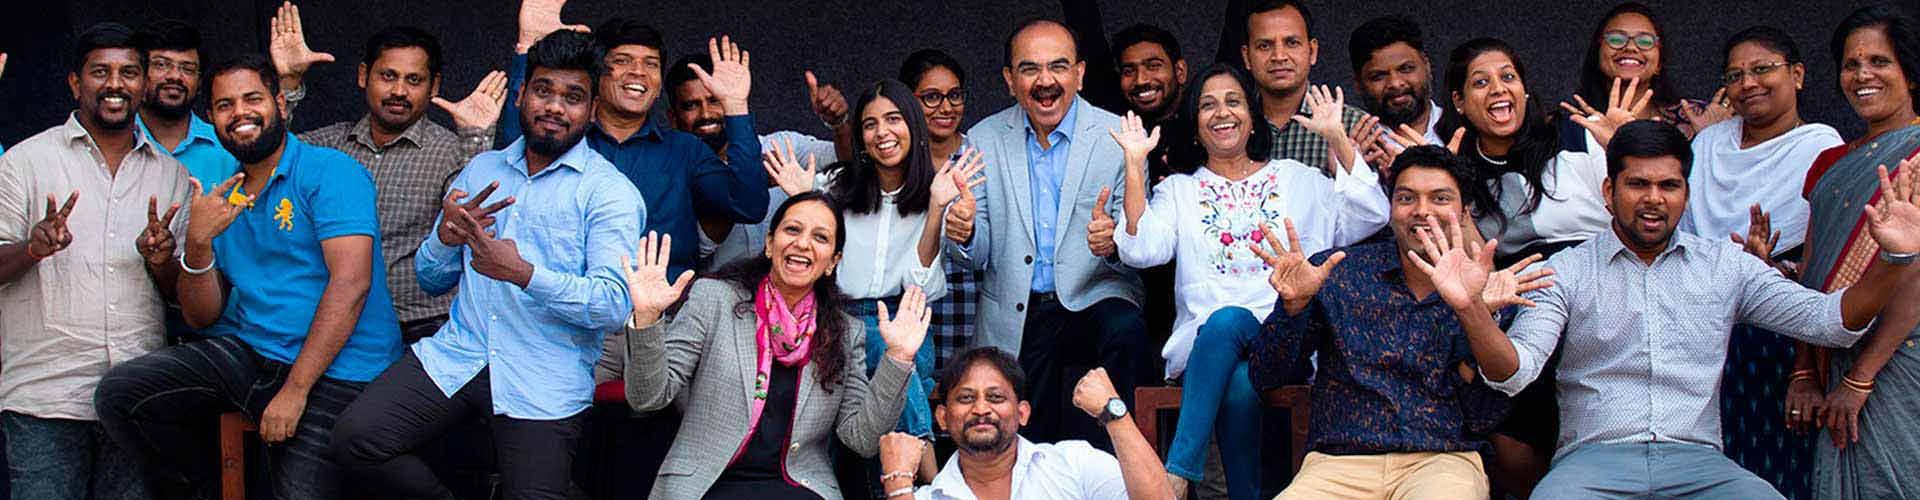 Leading Digital marketing company in Pune